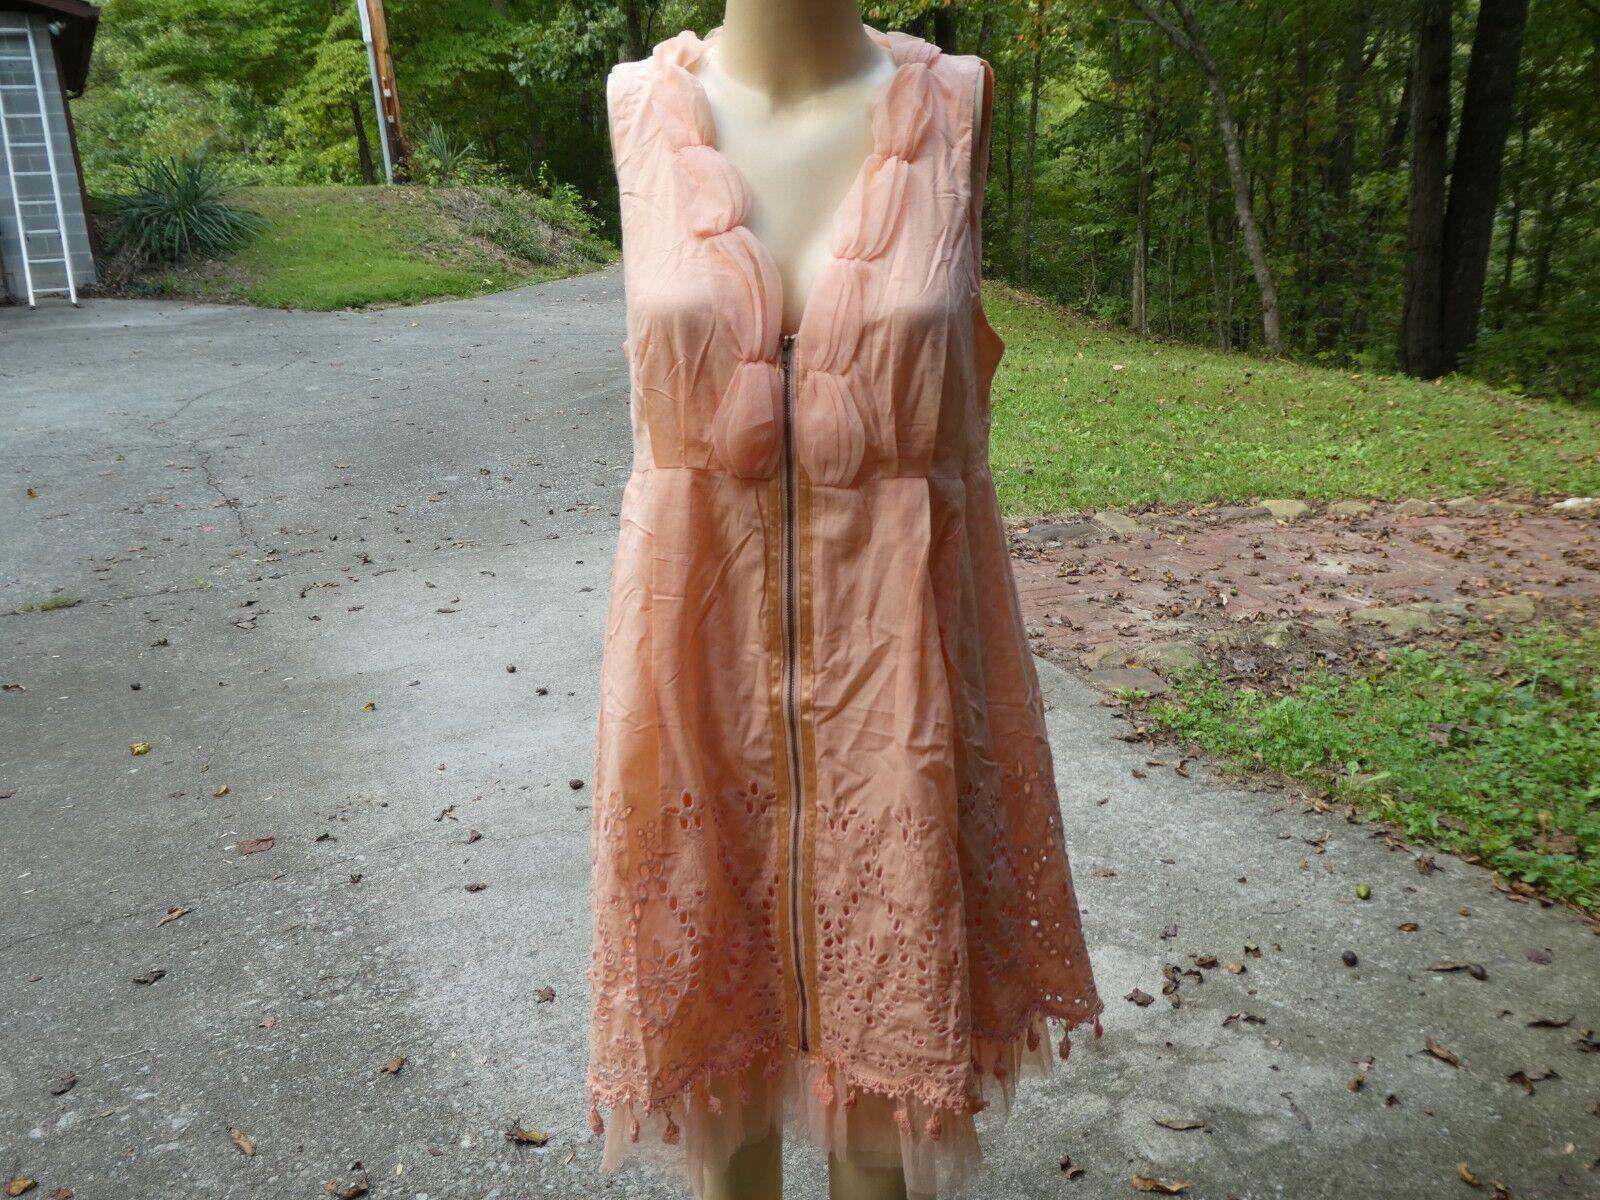 RYU Peach Embellished Sleeveless DressCotton PolyesterMEyelet NettingN W T